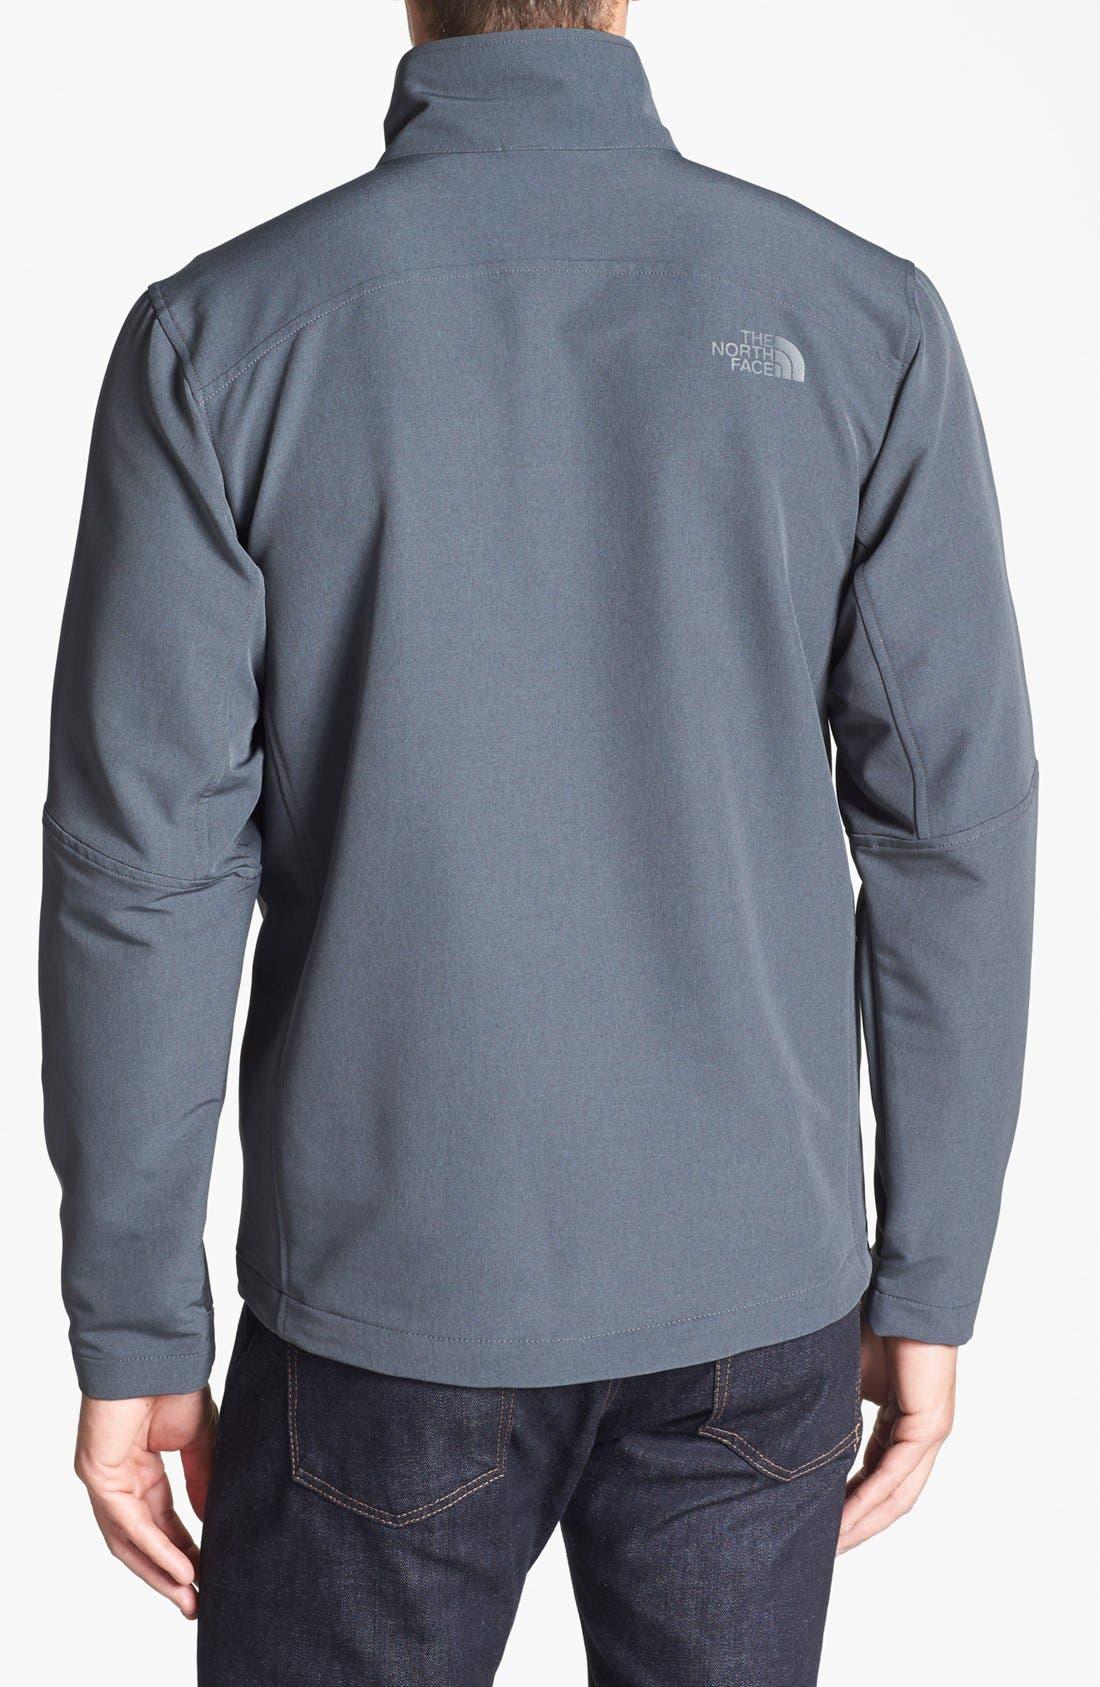 Alternate Image 2  - The North Face 'RDT' FlashDry™ Softshell Jacket